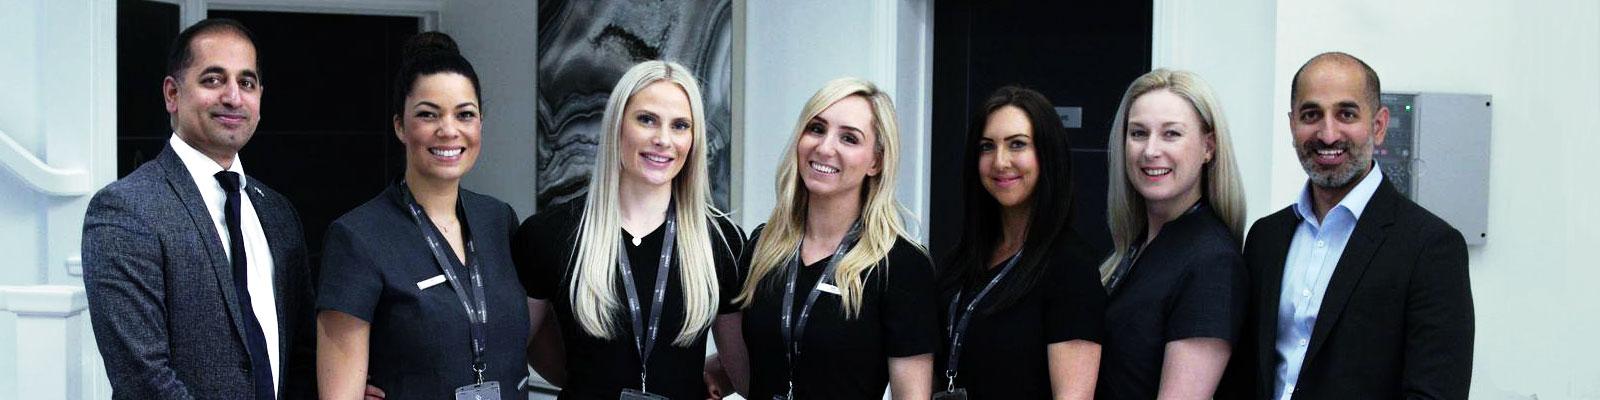 Derby Doctors Team